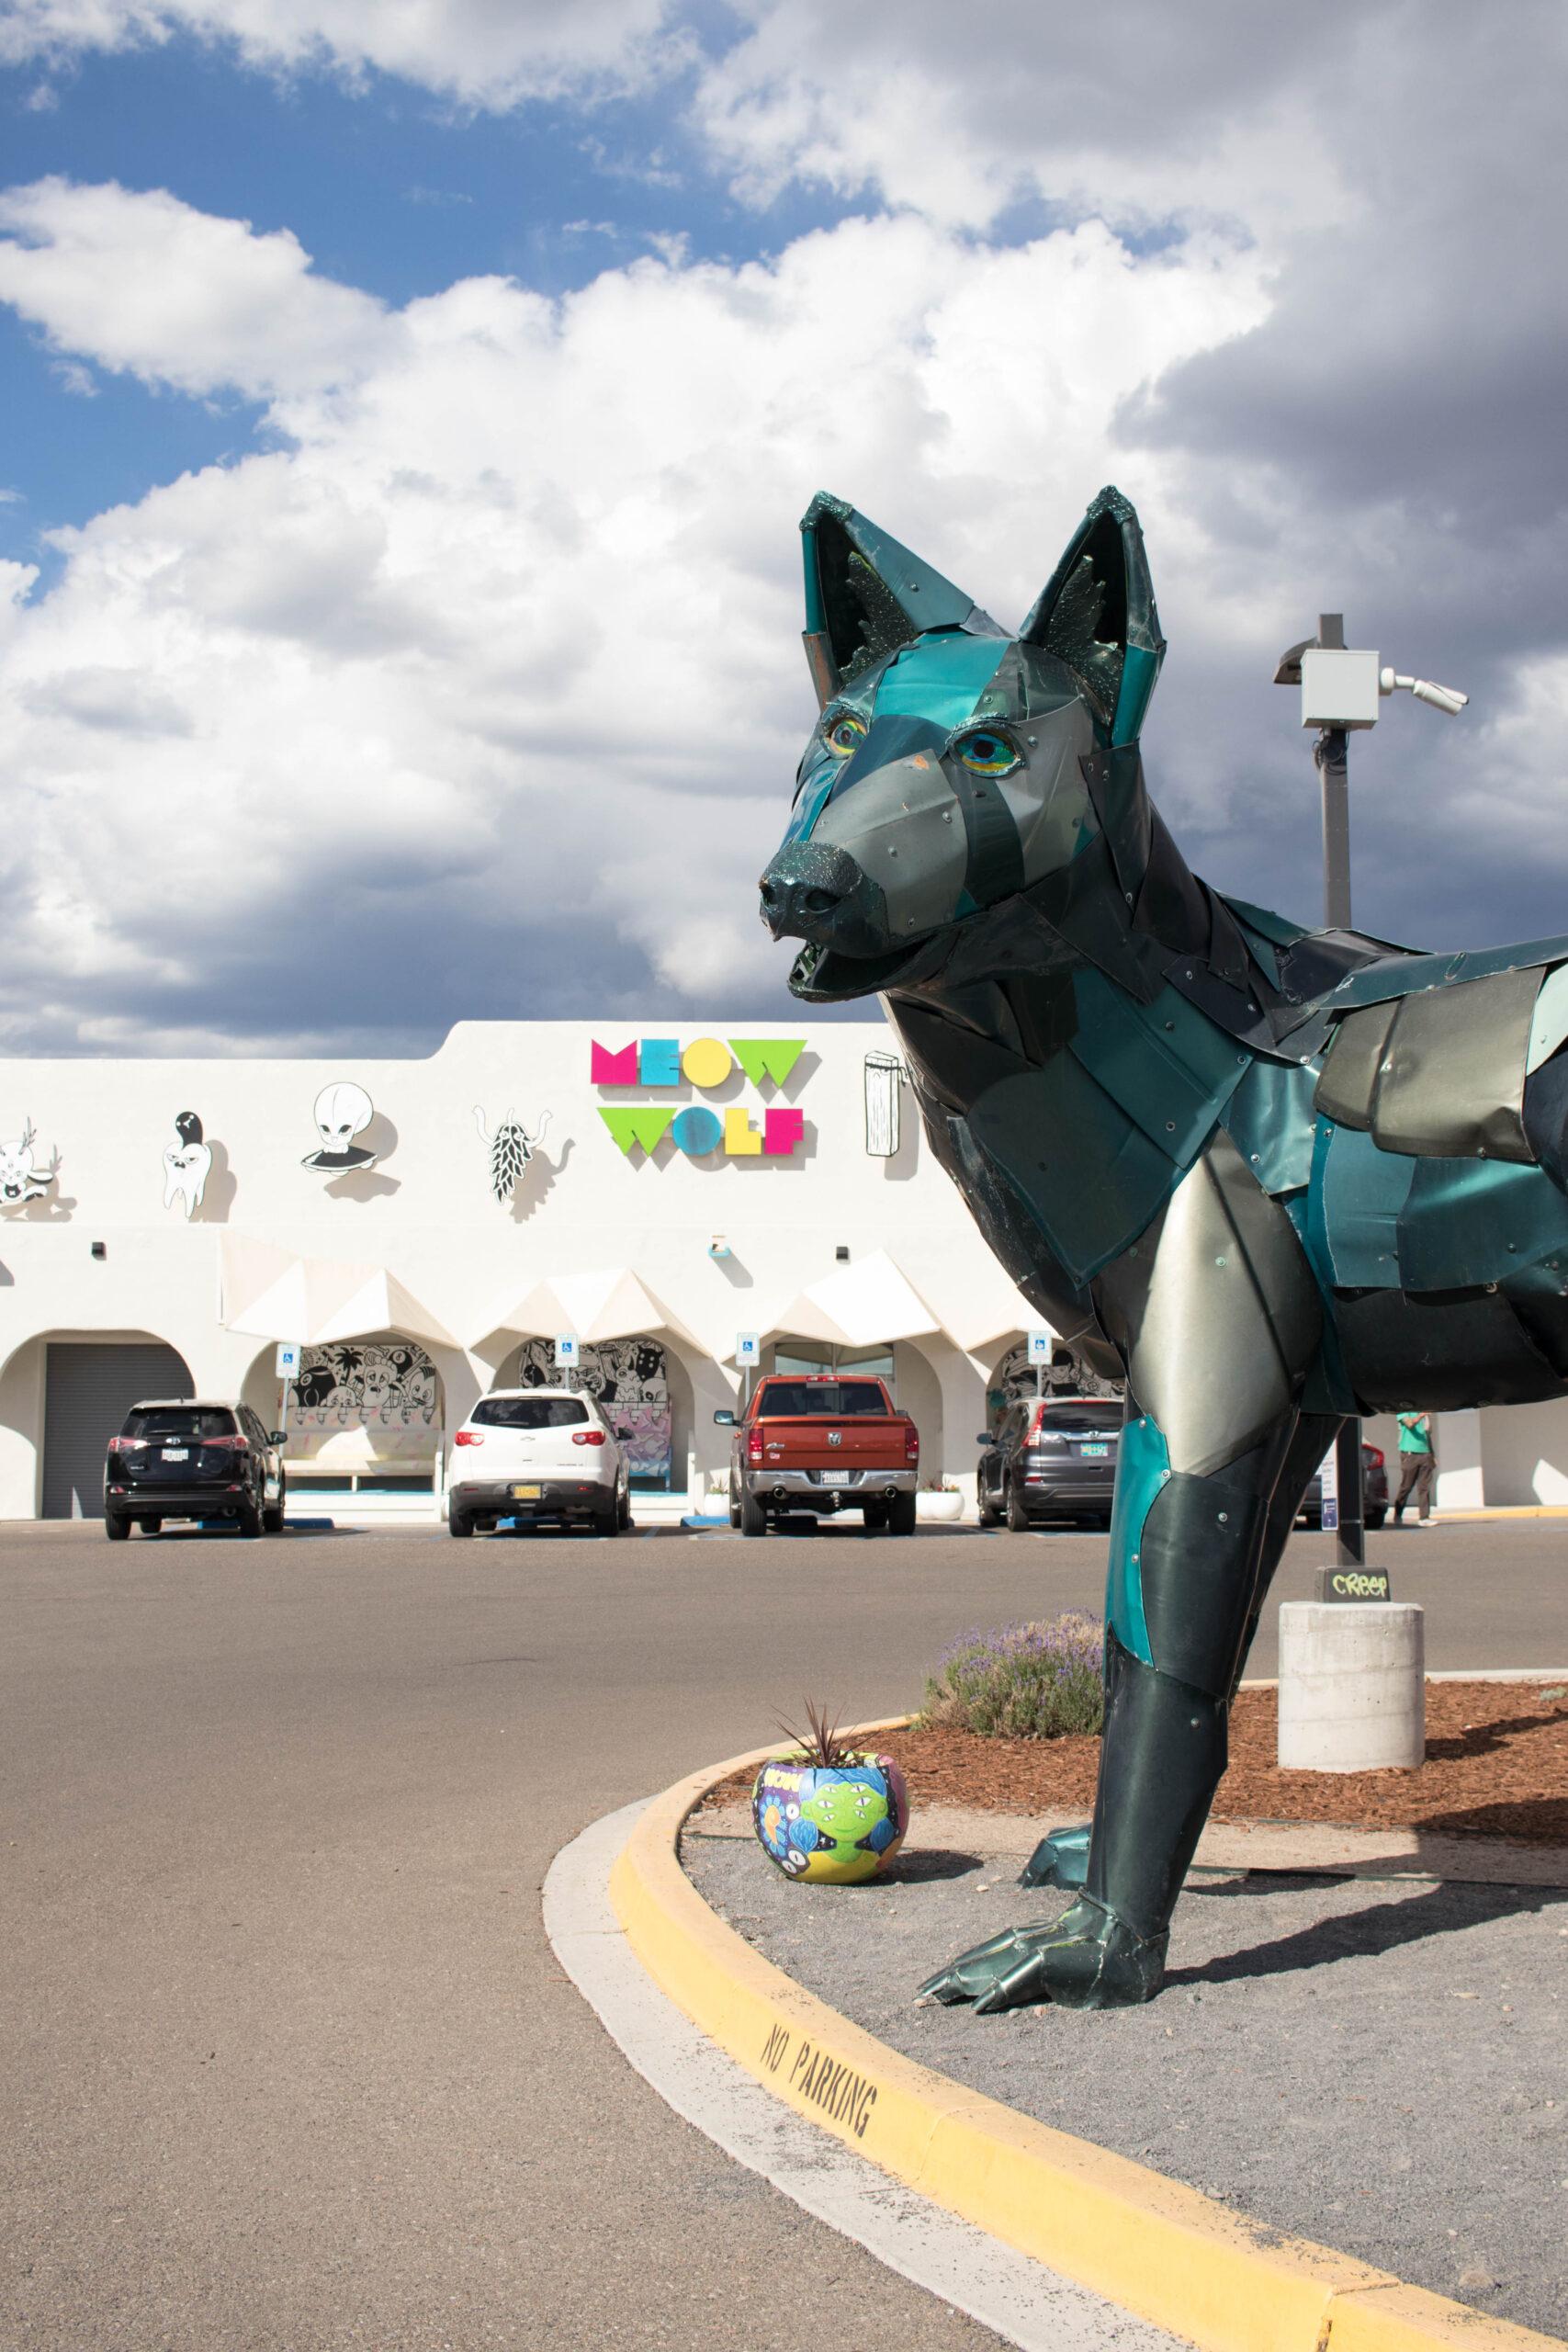 meow wolf Santa Fe #meowwolf #santafe #newmexicotrue